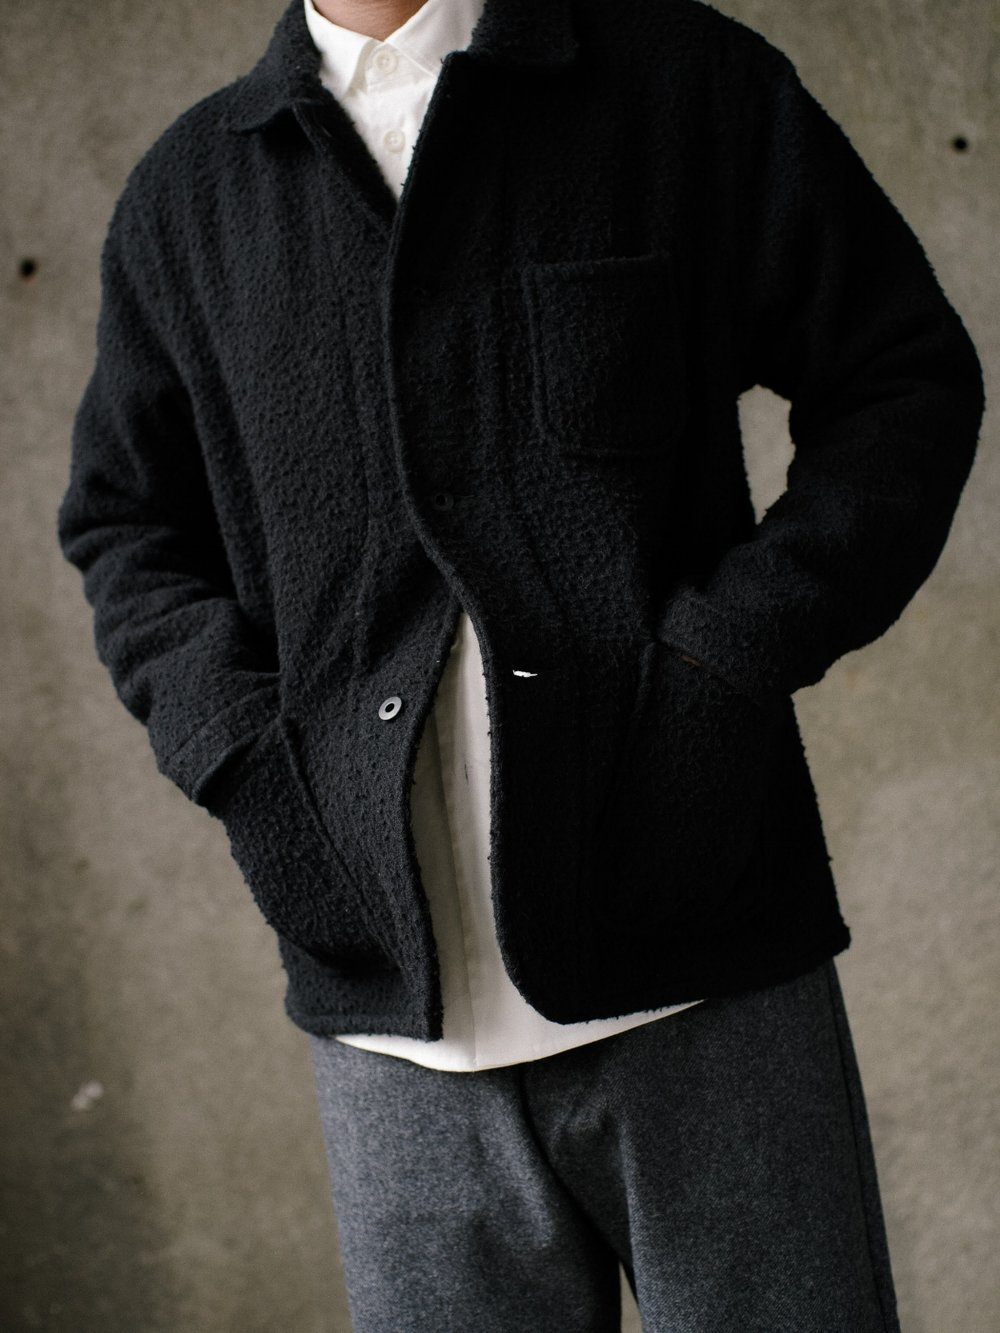 evan-kinori-three-pocket-jacket-casentino-wool-2